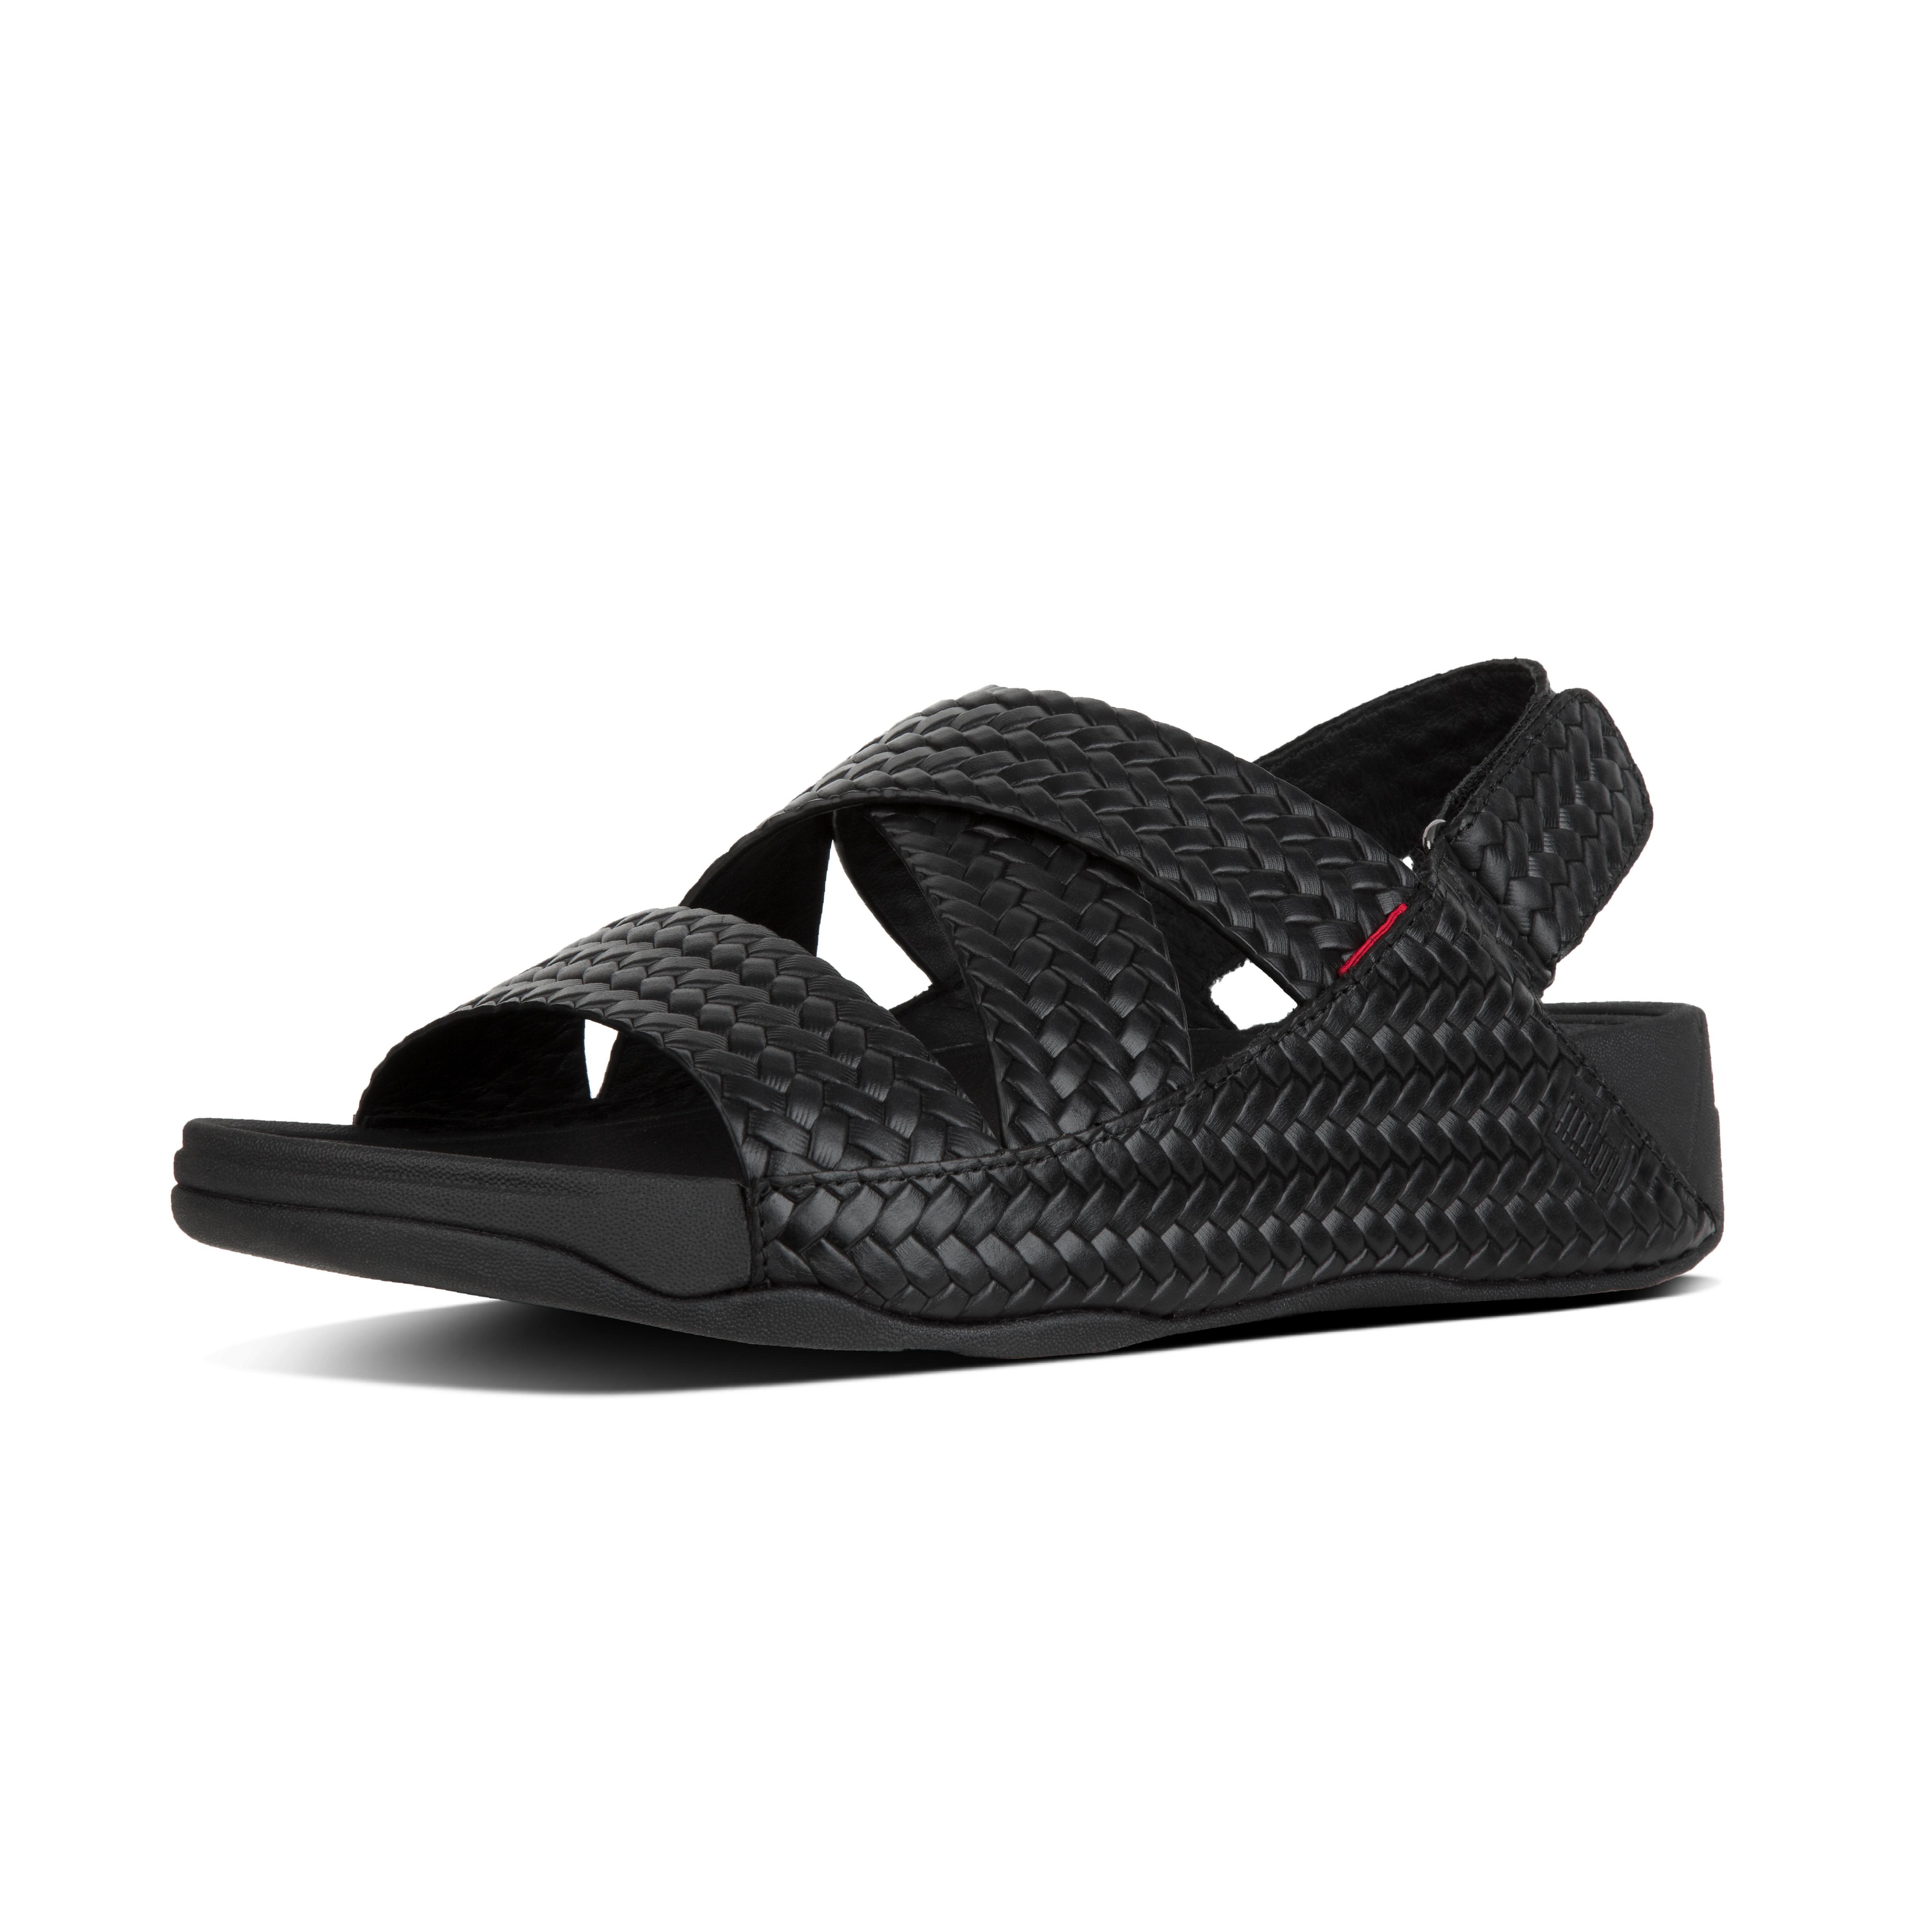 Chi sandal in woven embossed leather black k87 001?v=3